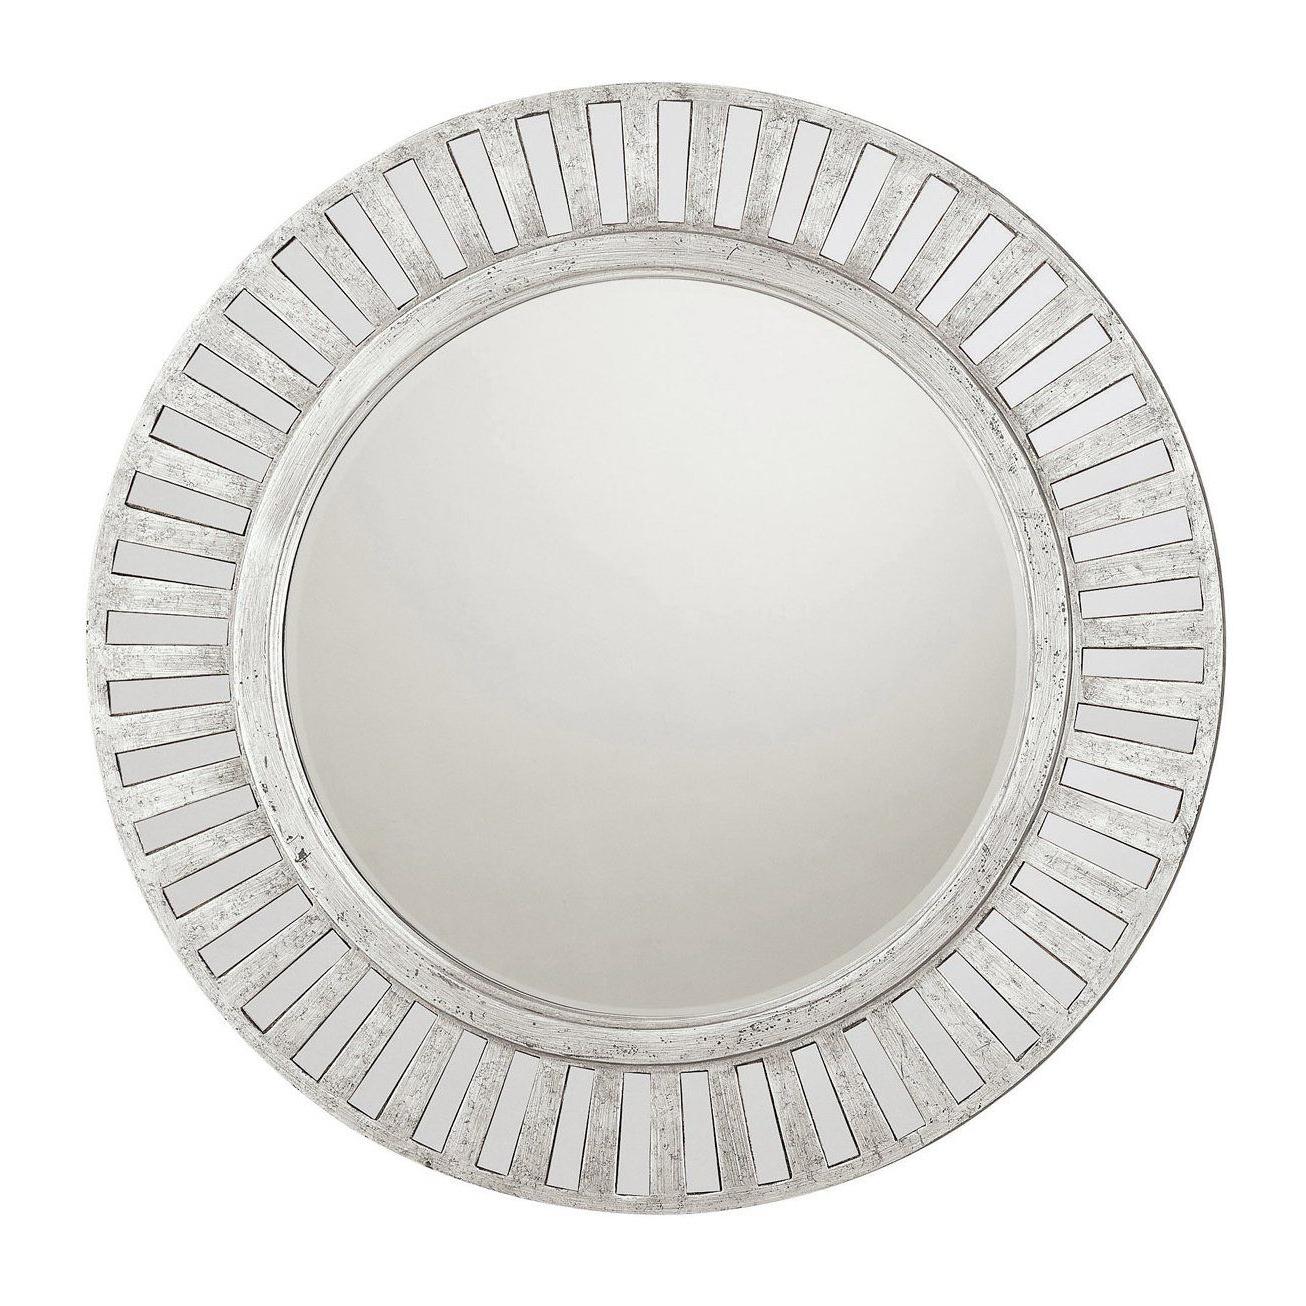 Most Popular Capital Lighting M242443 Decorative Wall Mirror, Antique Silver Regarding Lidya Frameless Beveled Wall Mirrors (View 8 of 20)